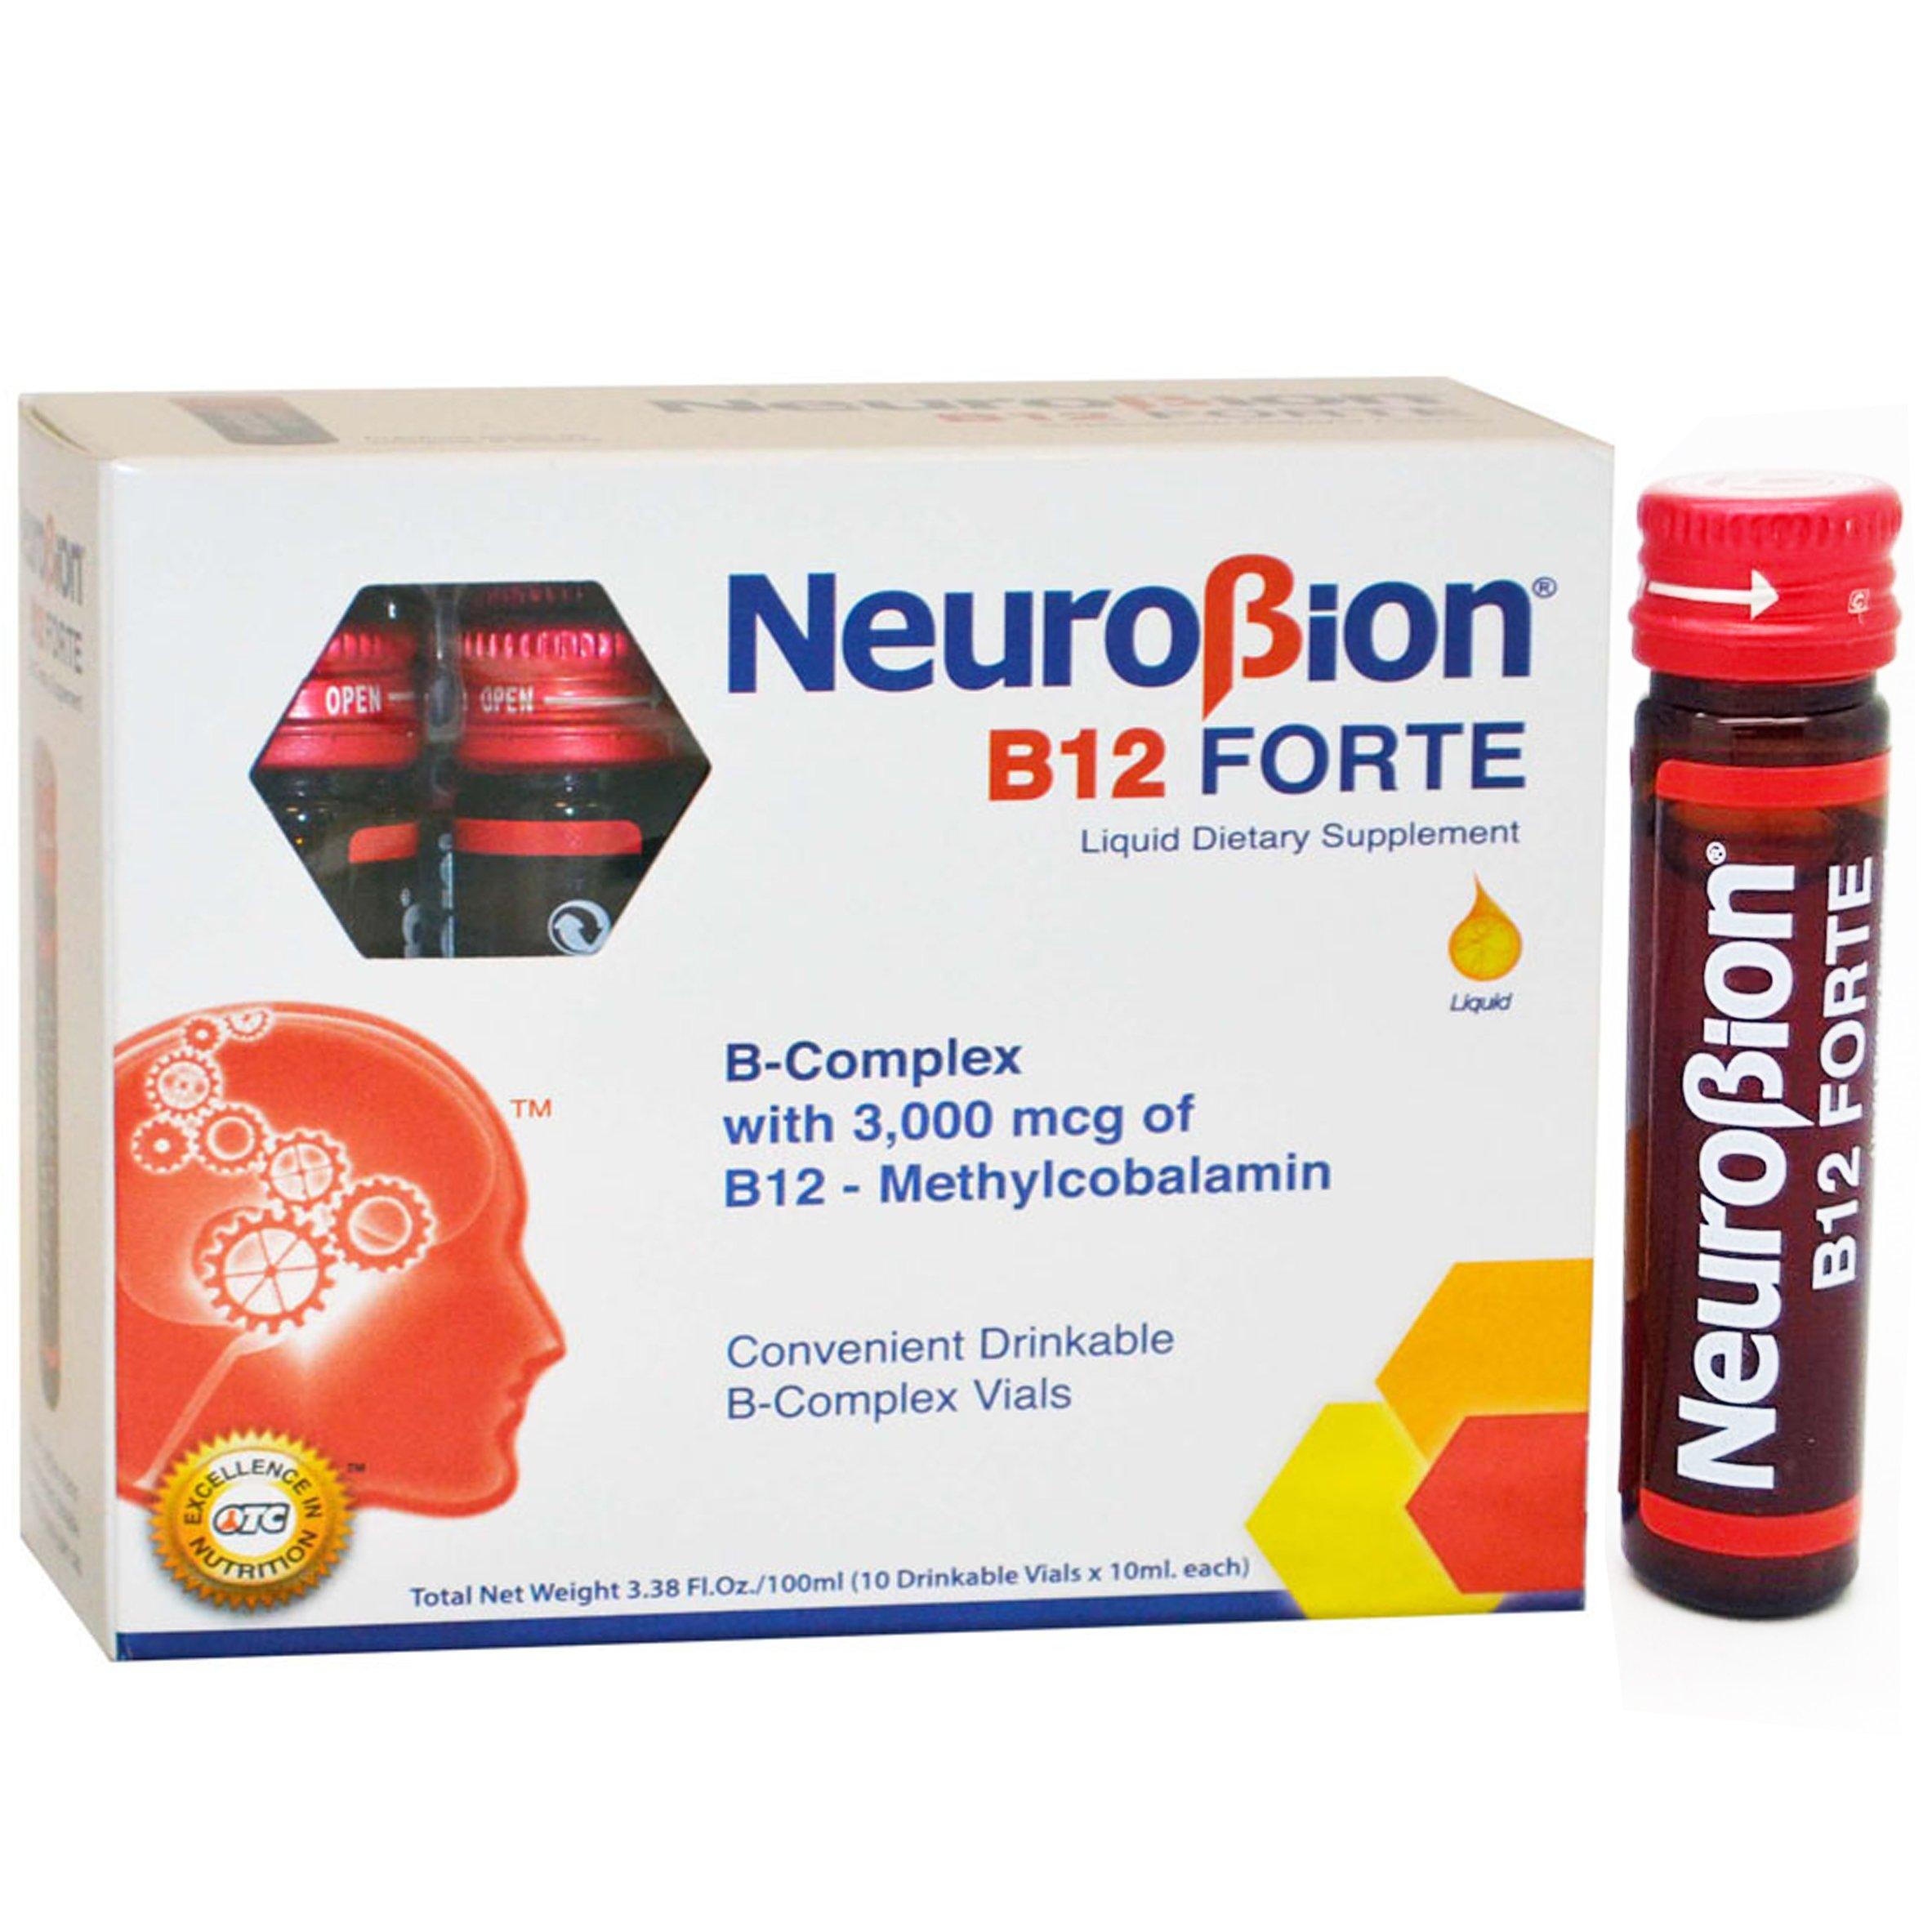 Neurobion B12 Forte 10 Vials x 10 ml